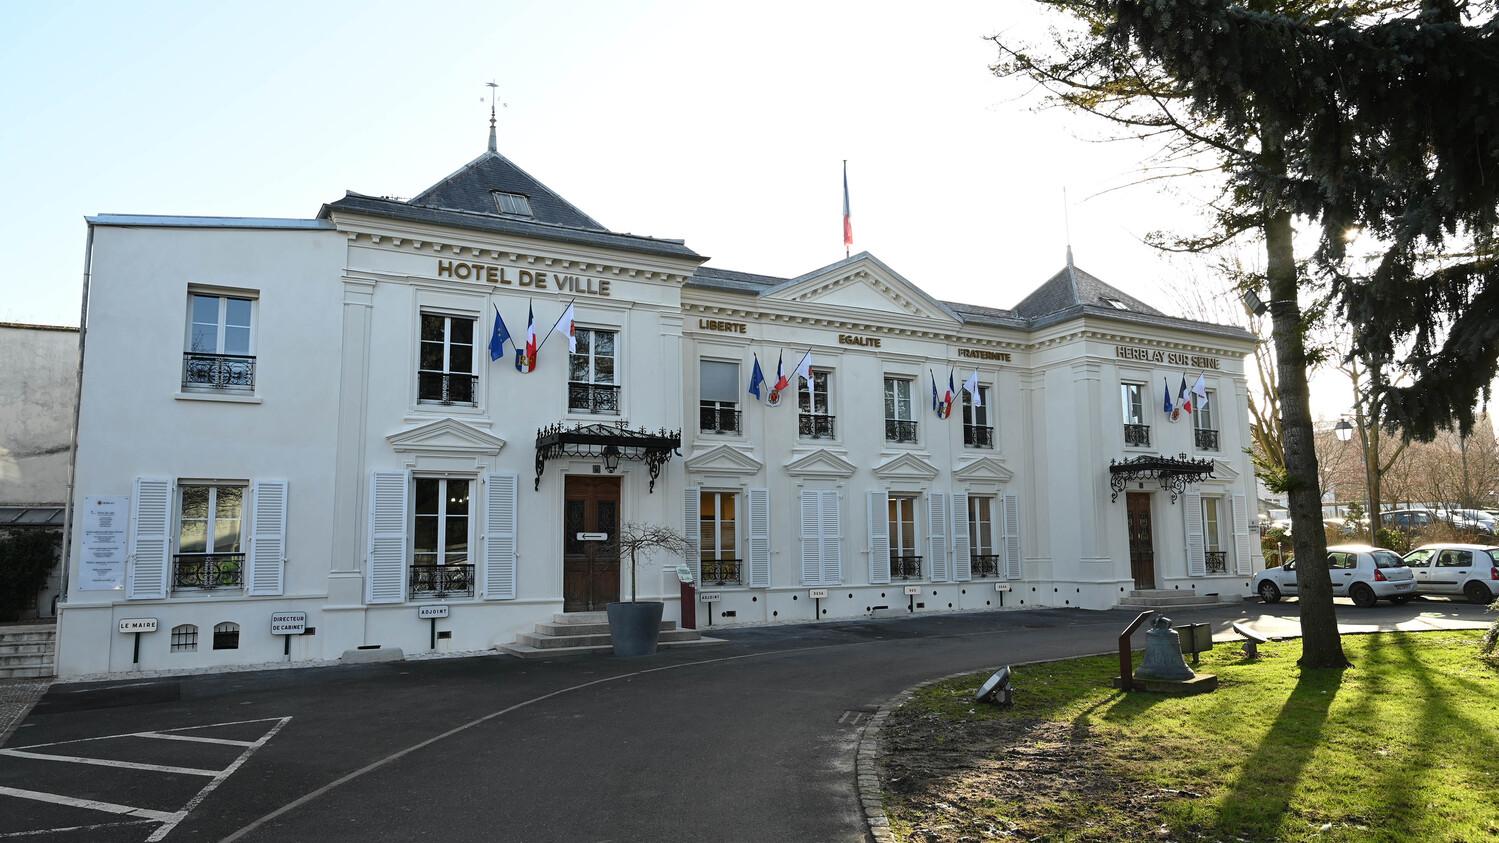 façade de la mairie de Herblay-sur-seine